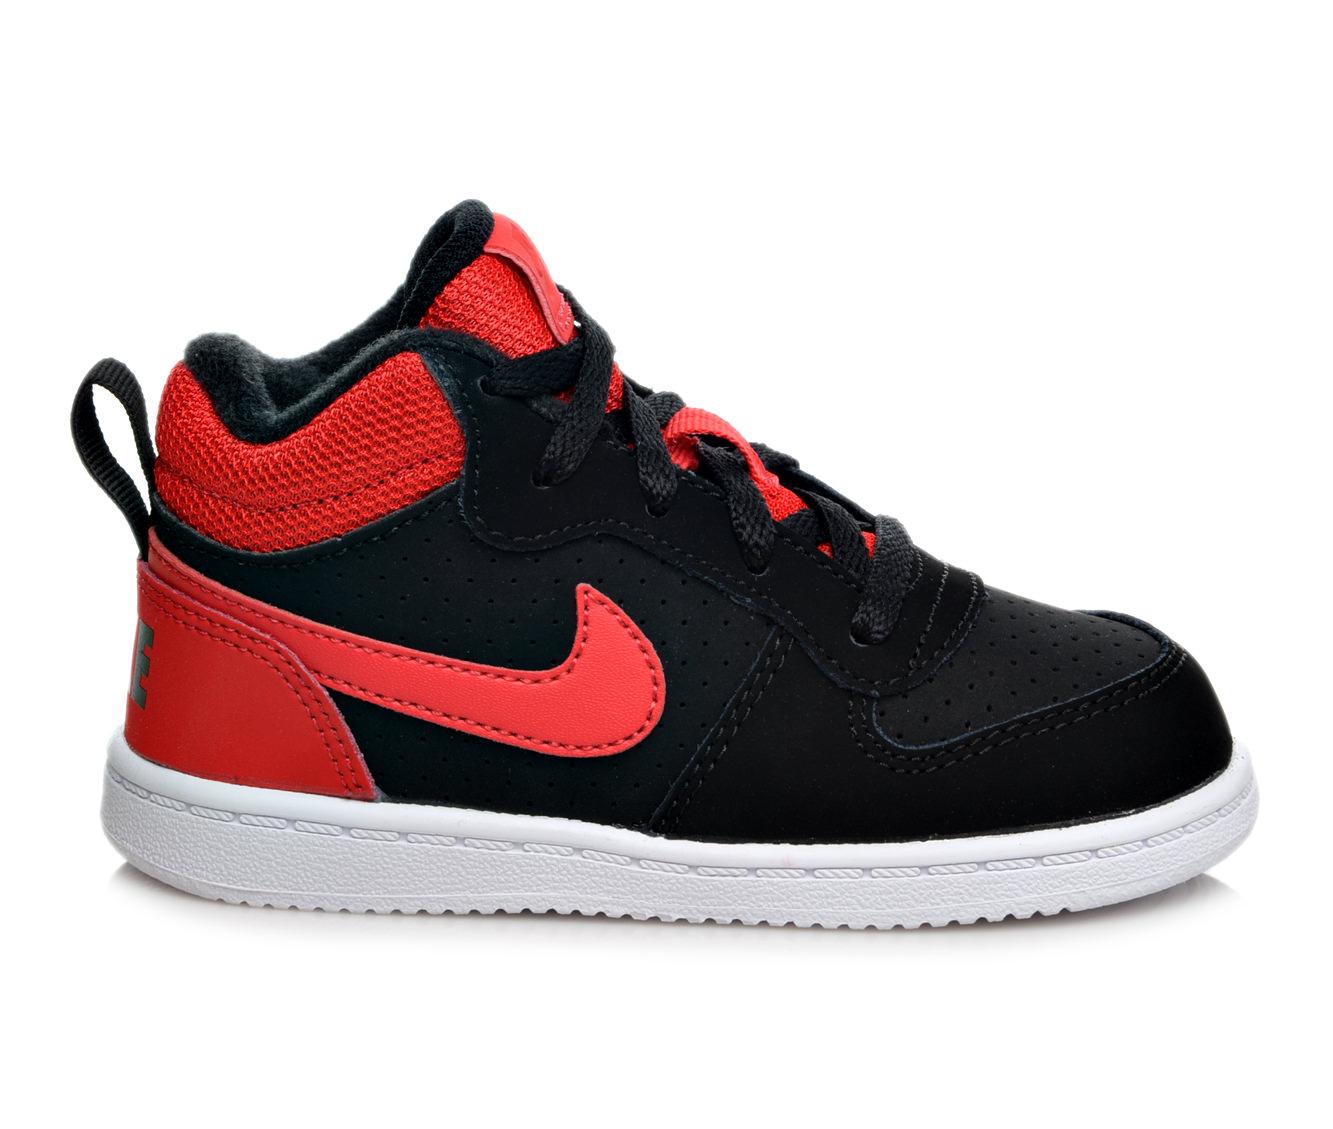 Boys' Nike Infant Court Borough Mid Sneakers (Black)